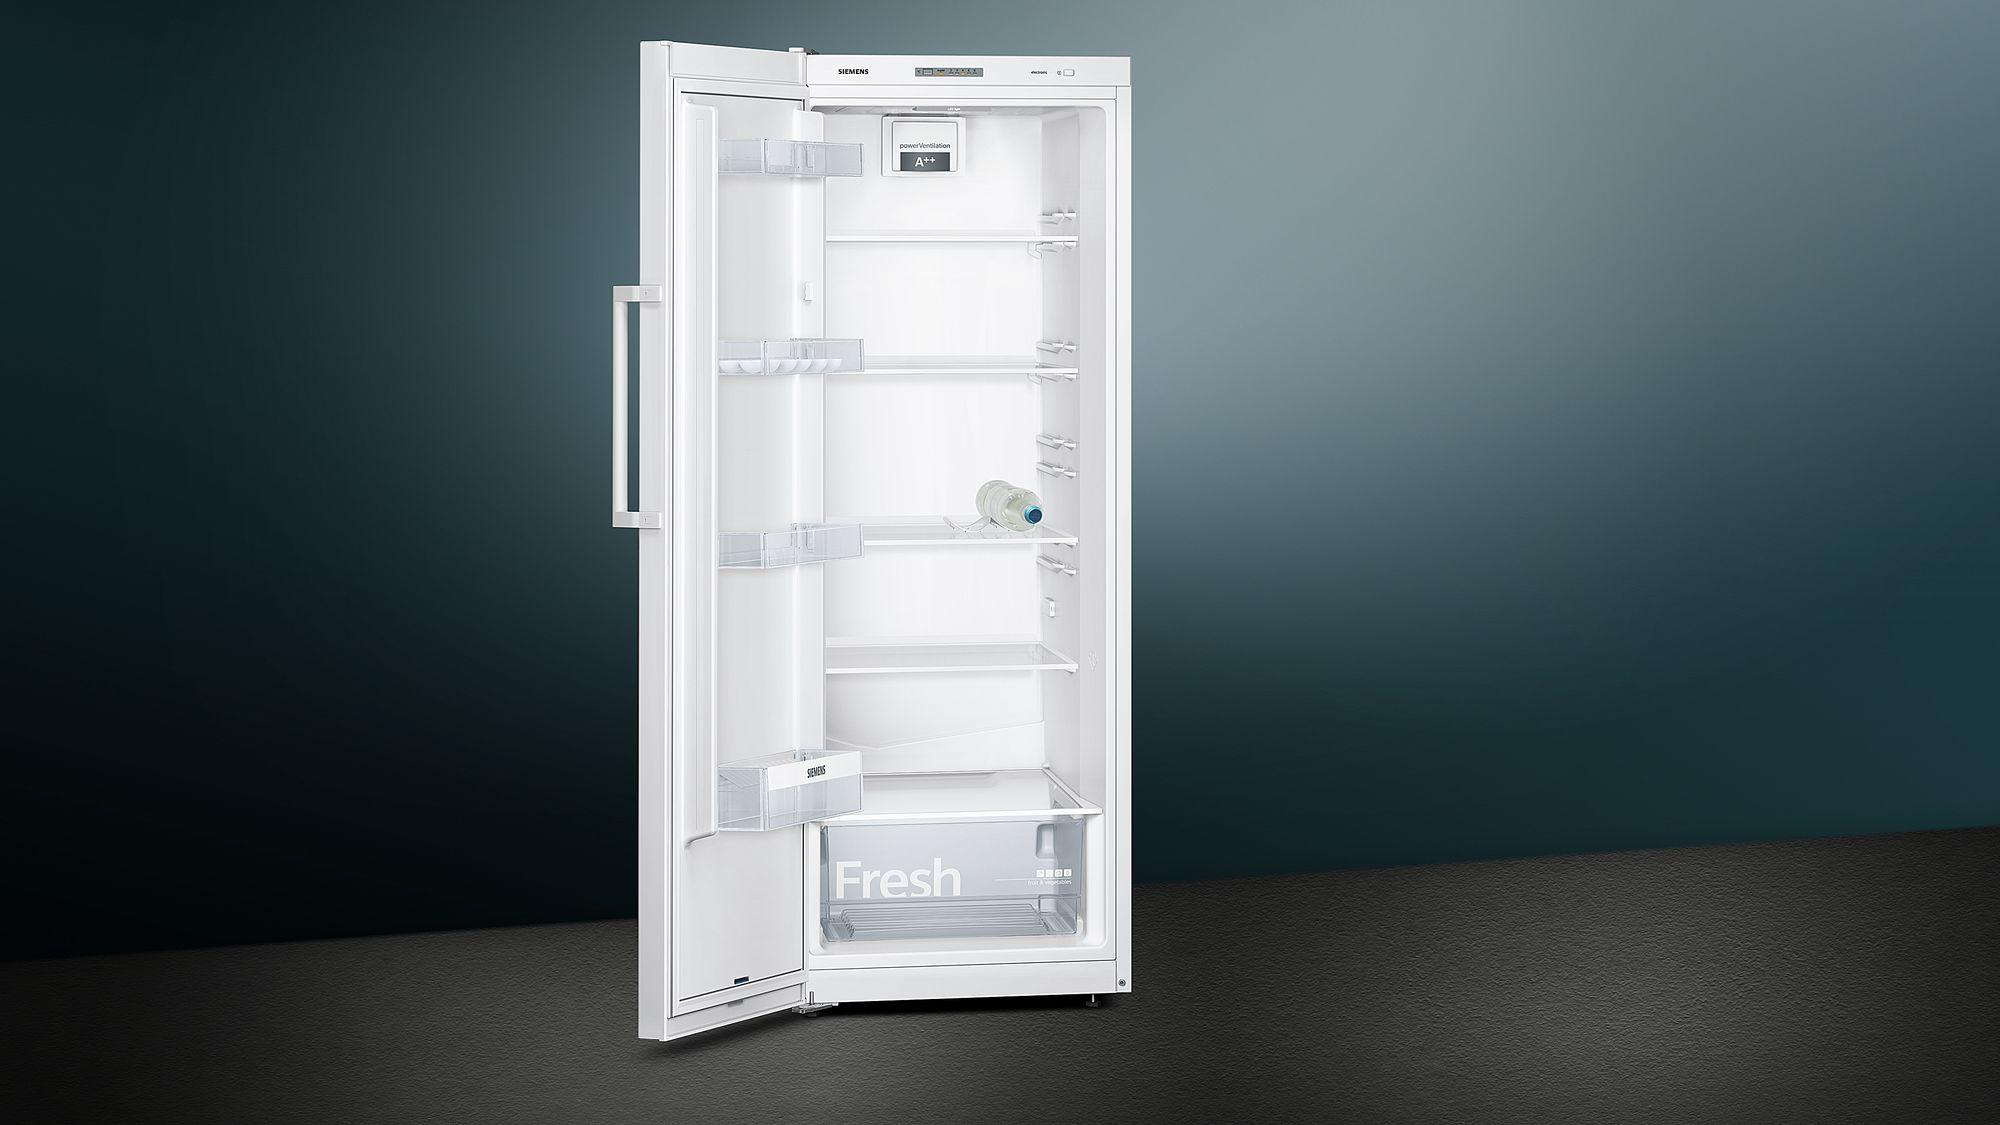 Siemens Kühlschrank : Siemens kühlschrank weis iq ks vnw p preisflix